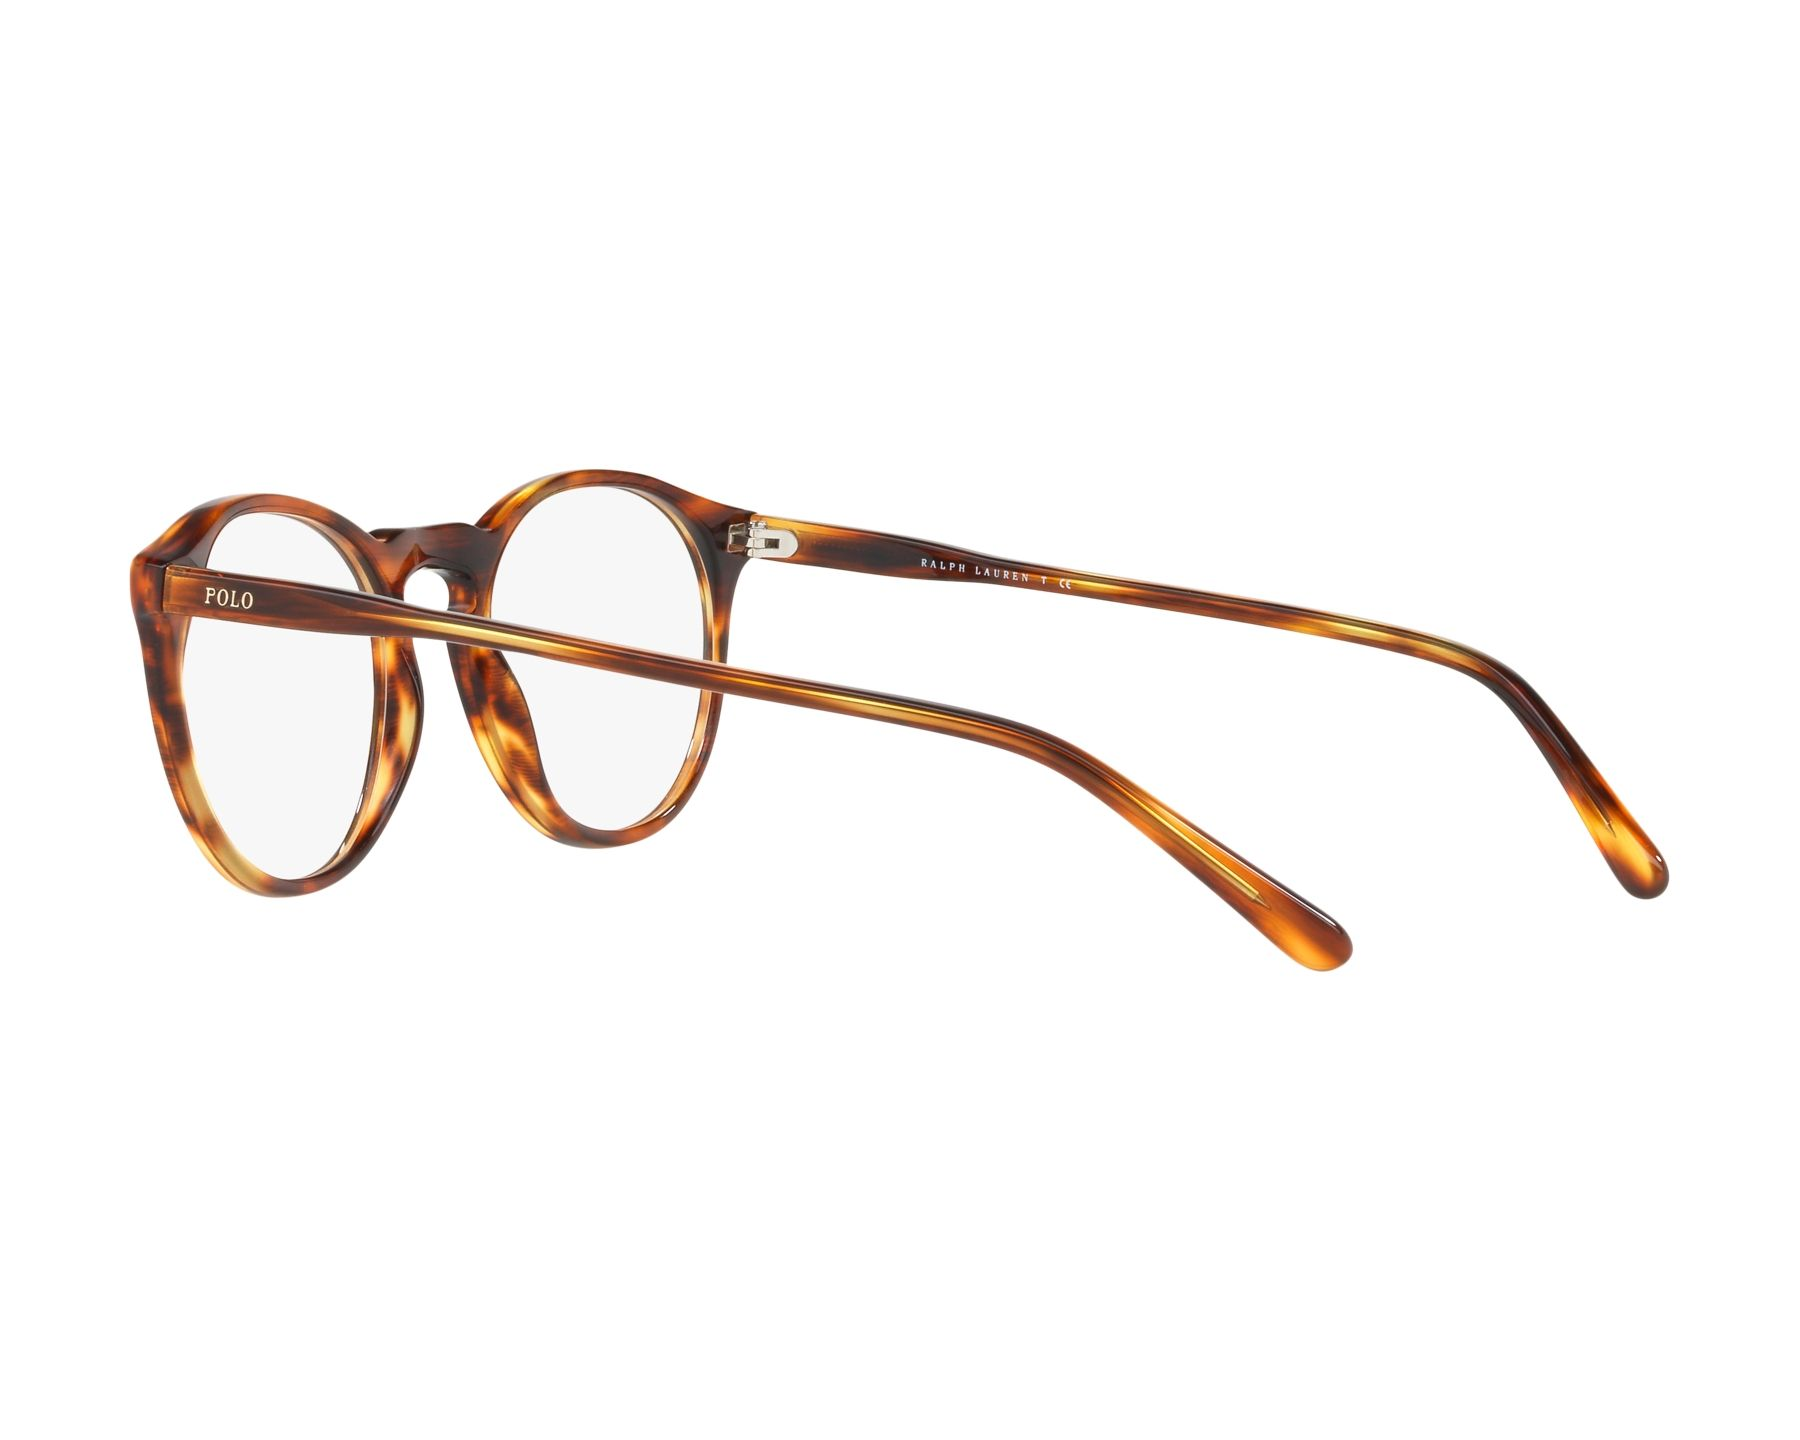 eyeglasses Polo Ralph Lauren PH-2180 5007 50-20 Havana 360 degree view 5 1f5c4ef2ad0